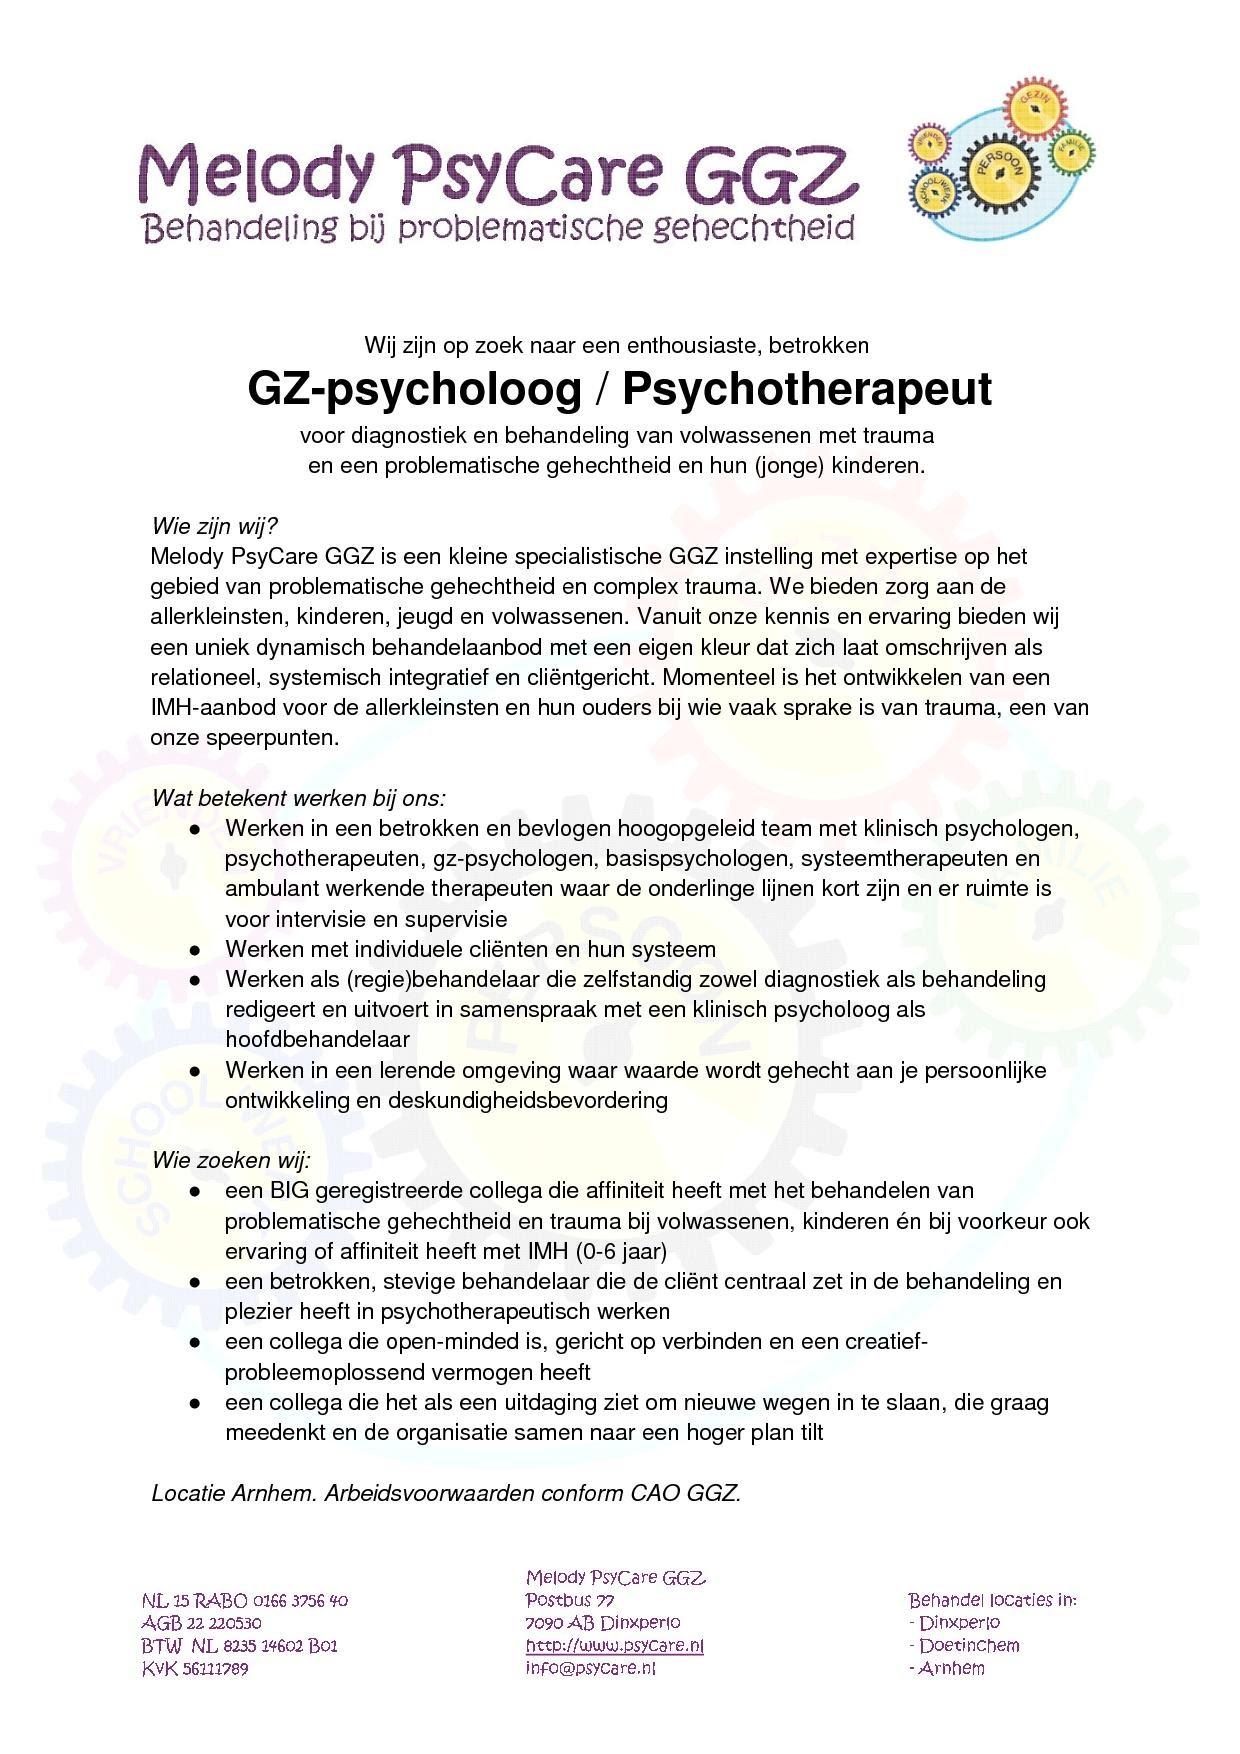 Vacature GZ-psycholoog / Psychotherapeut